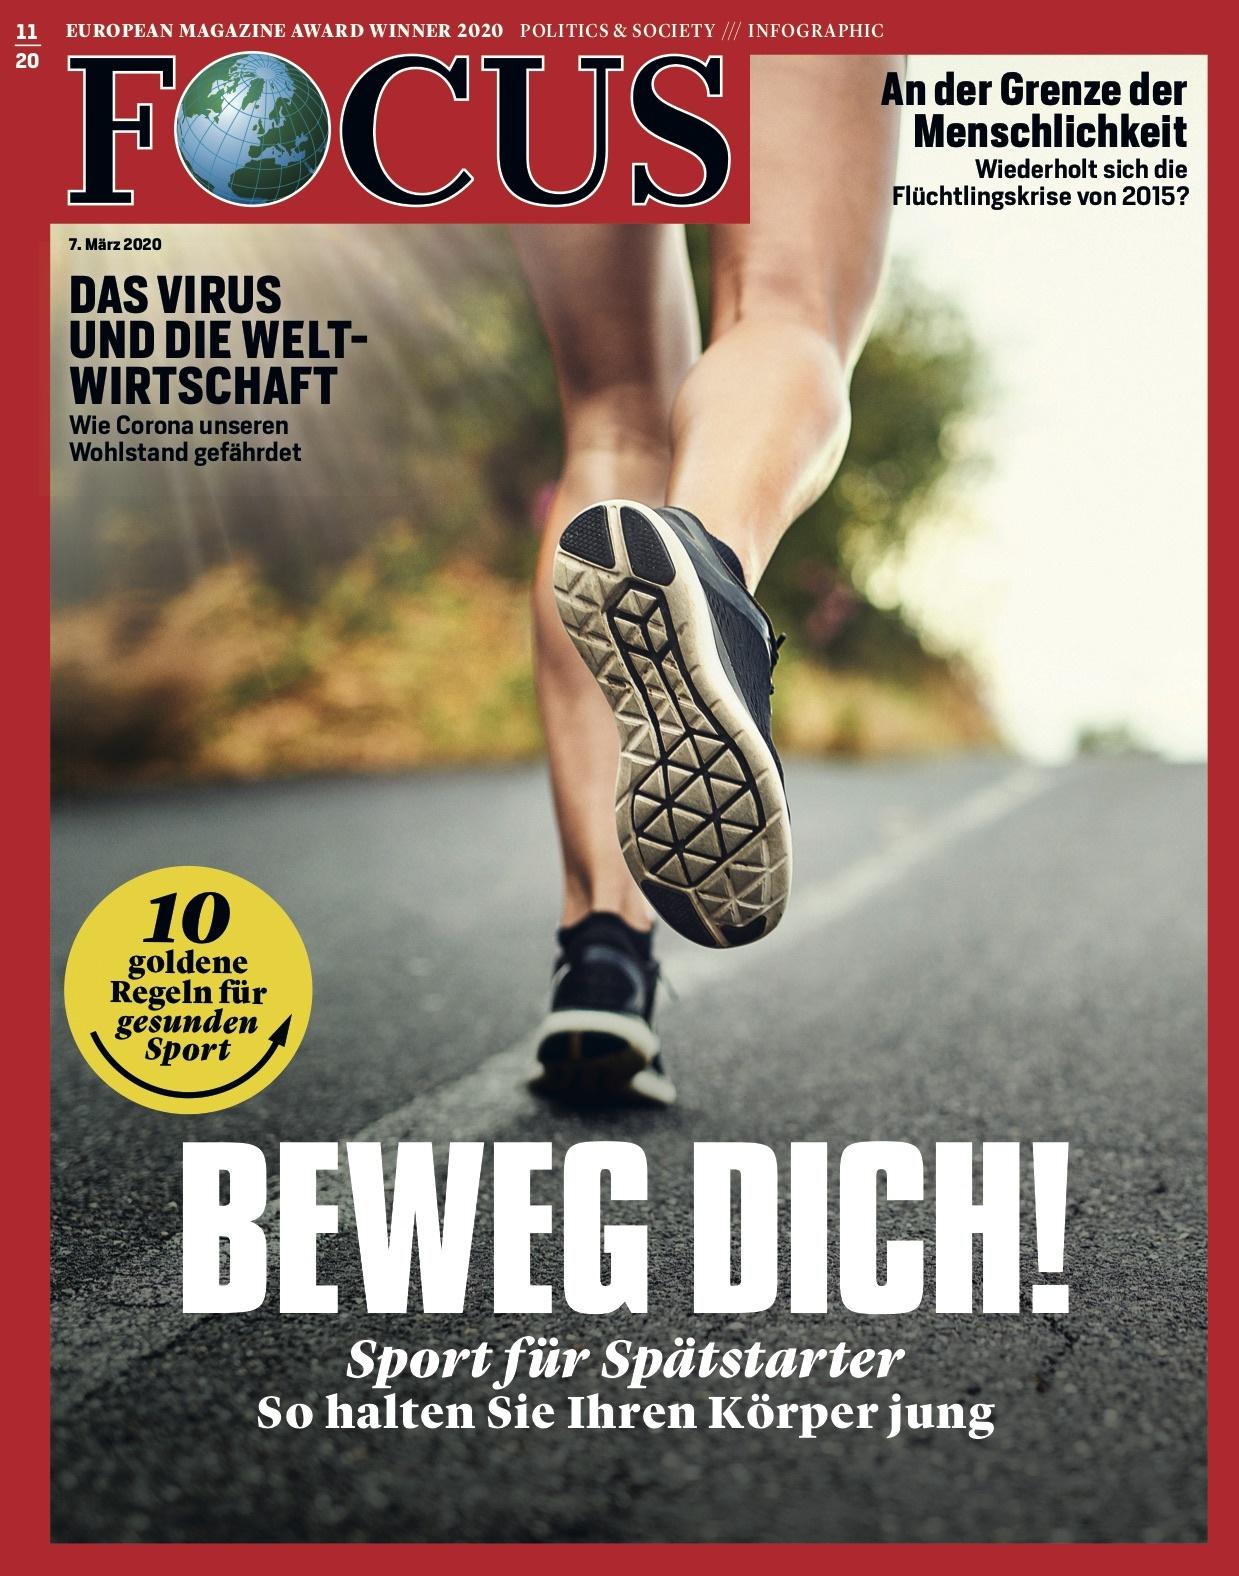 FOCUS Magazin FOCUS Magazin - Beweg dich!